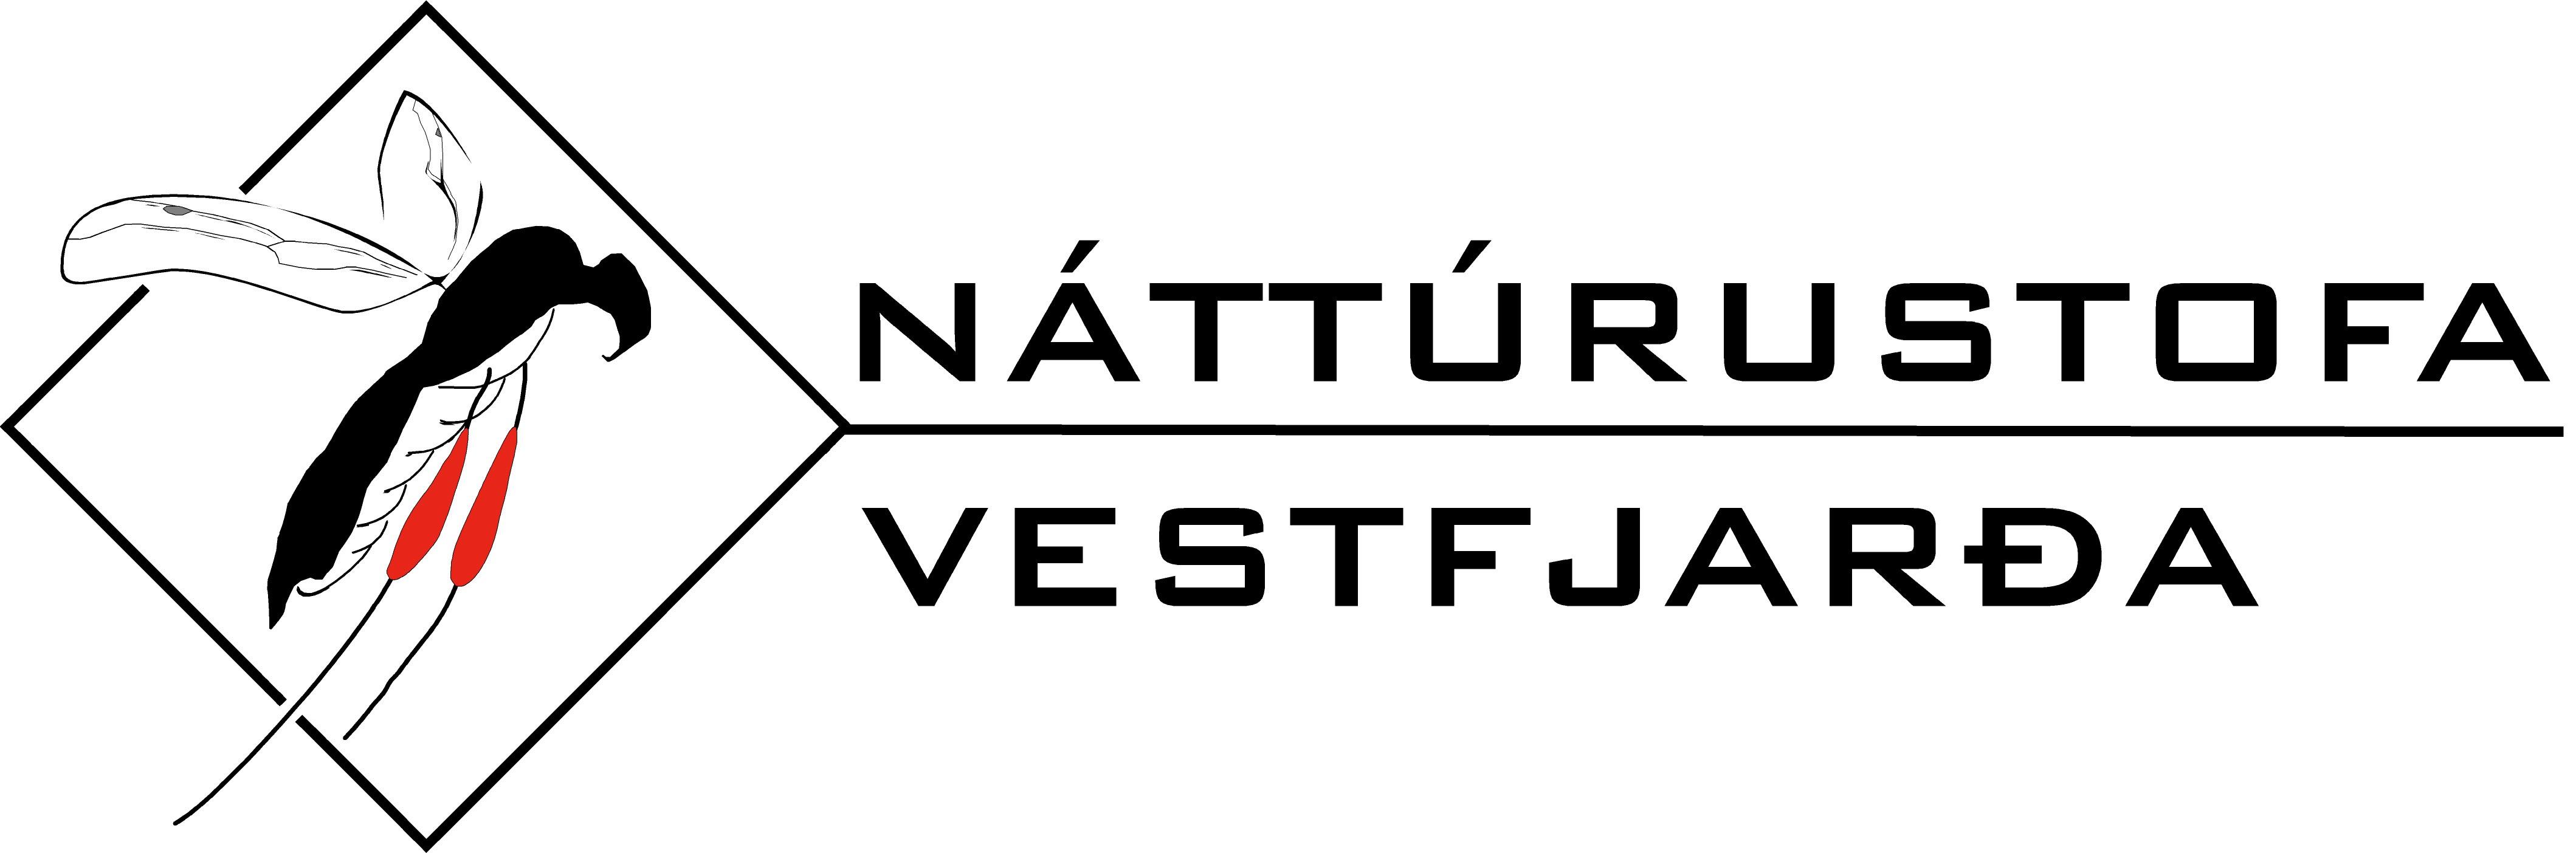 NAVE logo